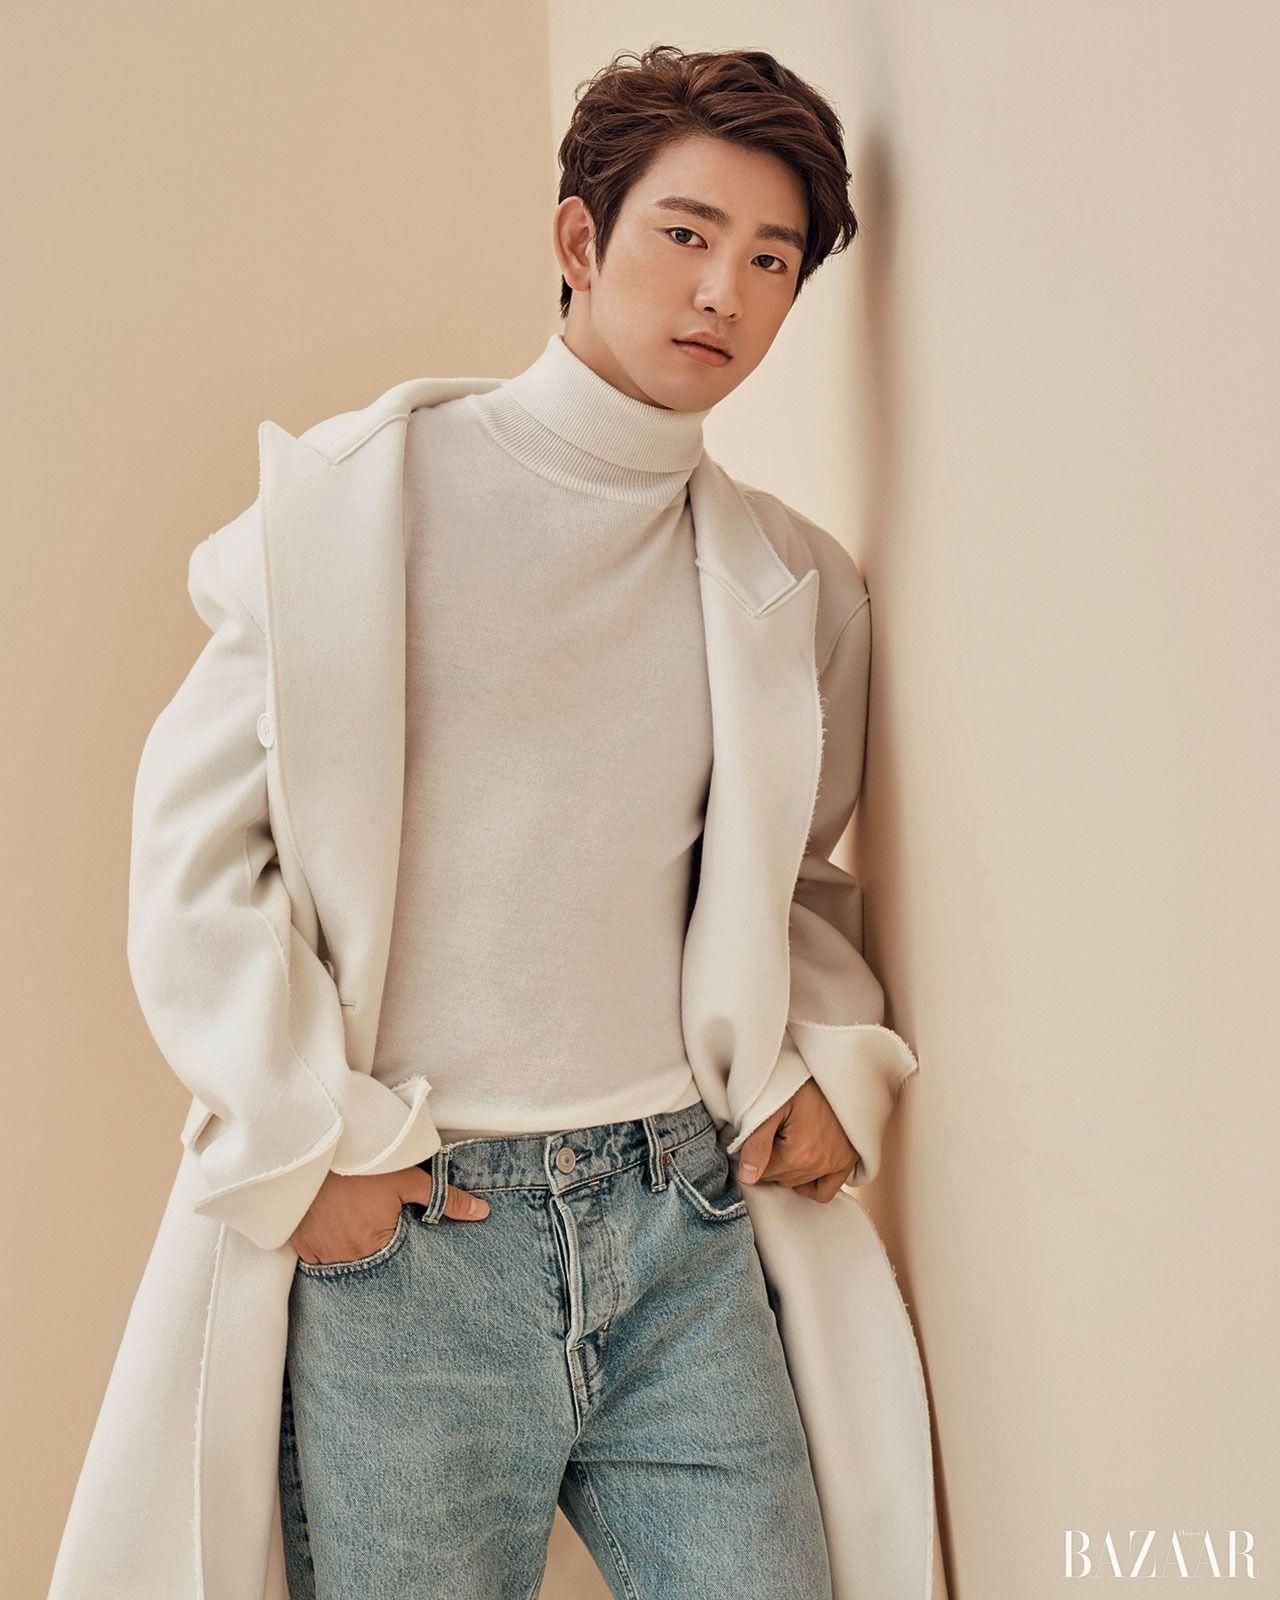 jinyoungwhite_8b